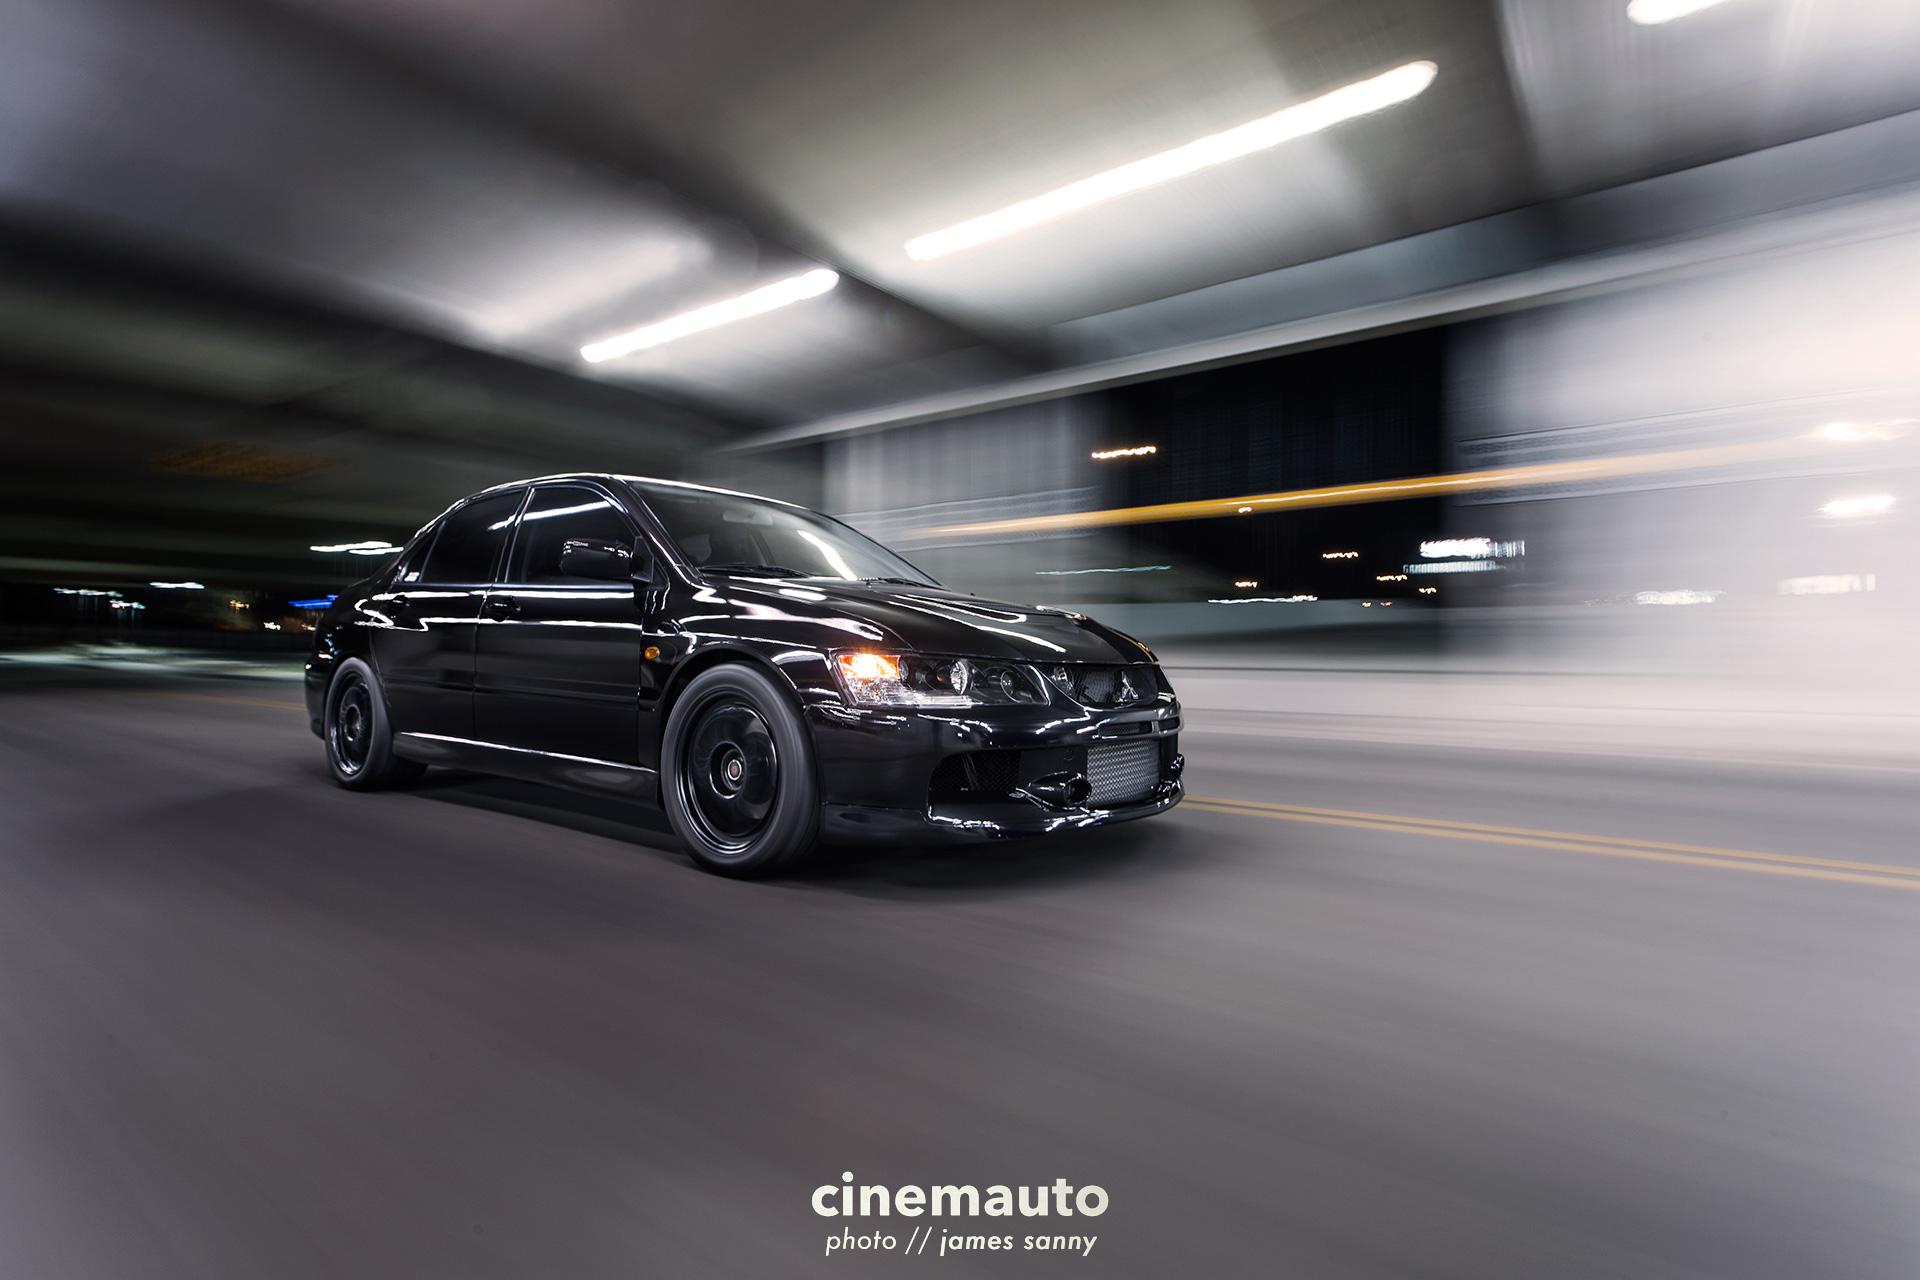 wichita-automotive-photographer-cinemauto-james-sanny-tj13sm.jpg